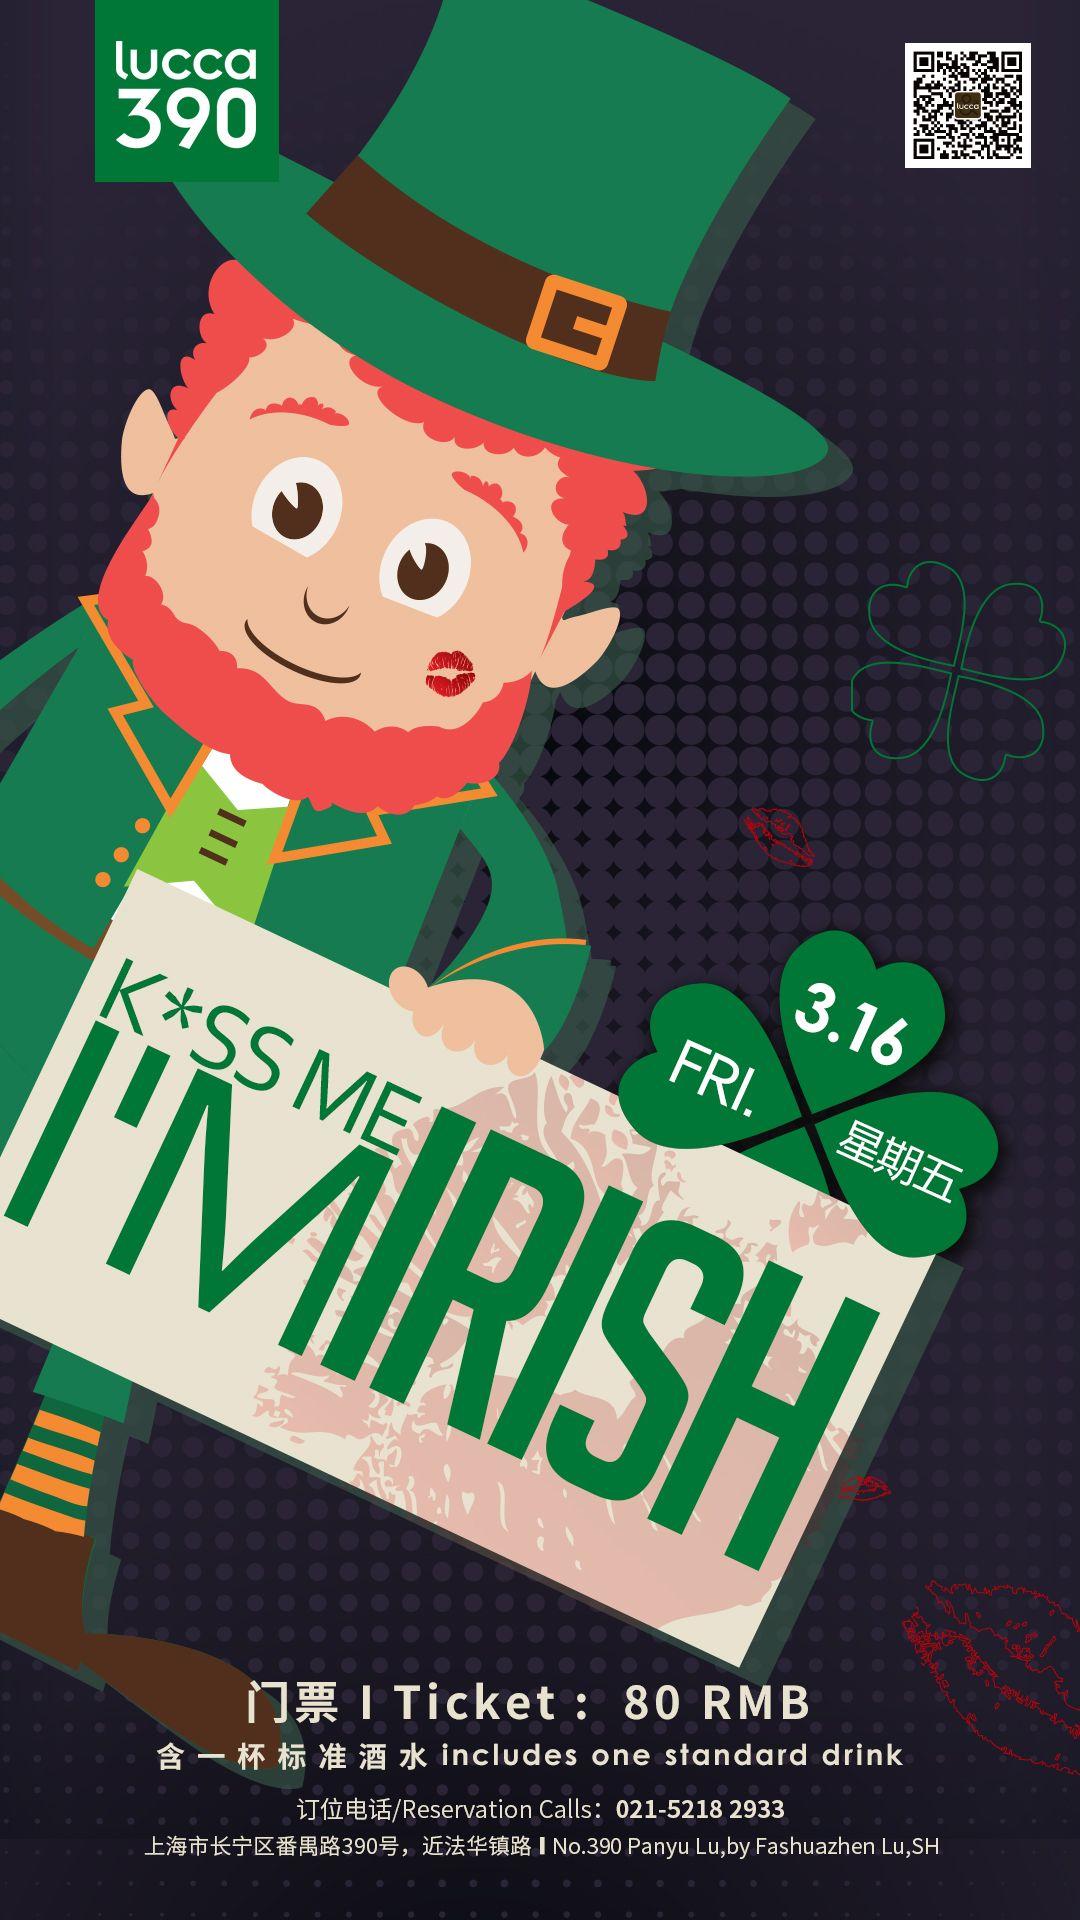 Kiss Me I'm Irish at Lucca 390